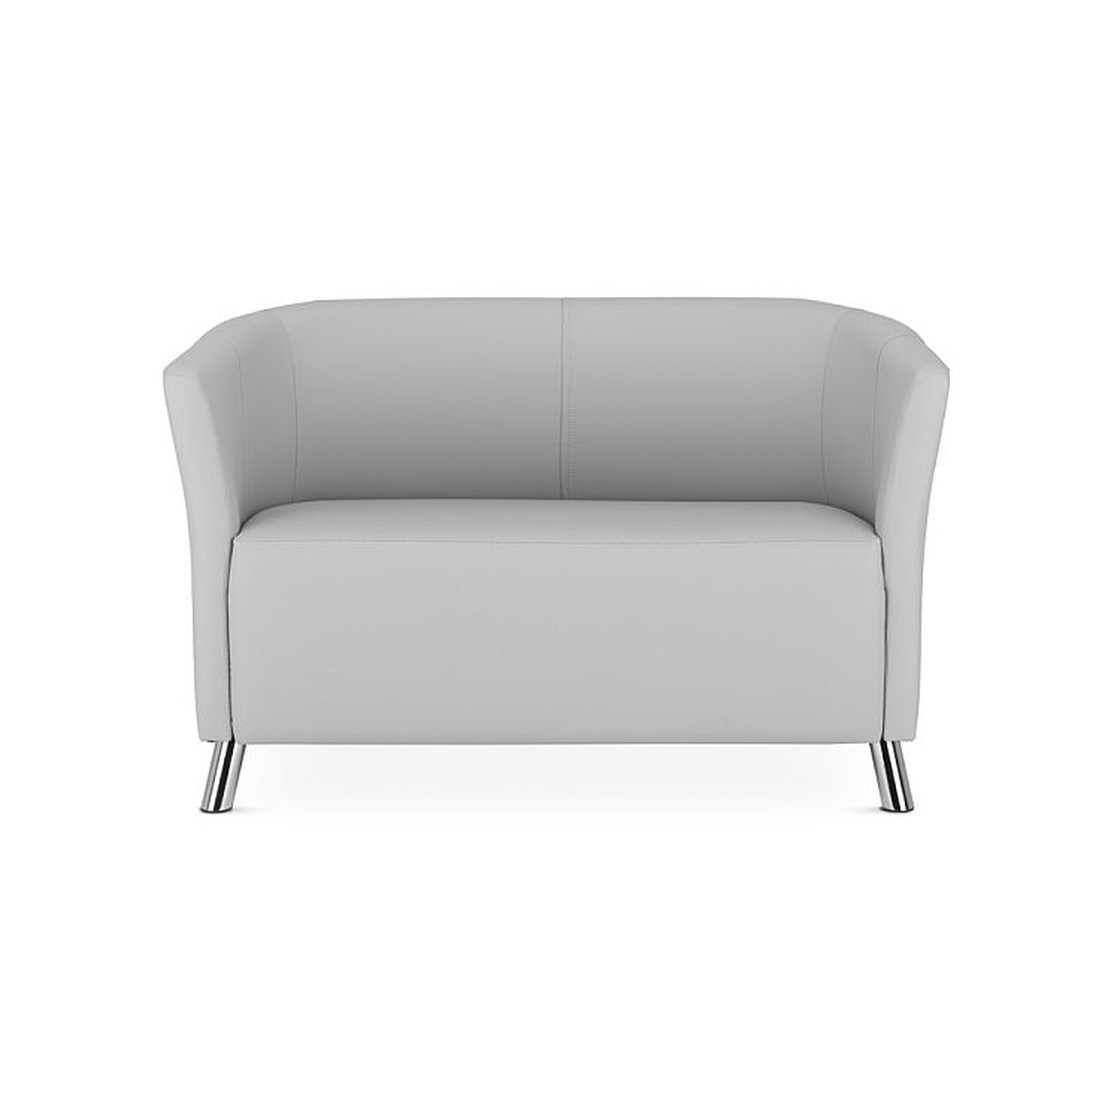 Full Size of 2 Sitzer Sofa Lounger Sessel Columbia Duo Kunstleder Togo Bett Selber Bauen 180x200 Federkern Englisches Zweisitzer Polyrattan 140x200 Ohne Kopfteil Stressless Sofa 2 Sitzer Sofa